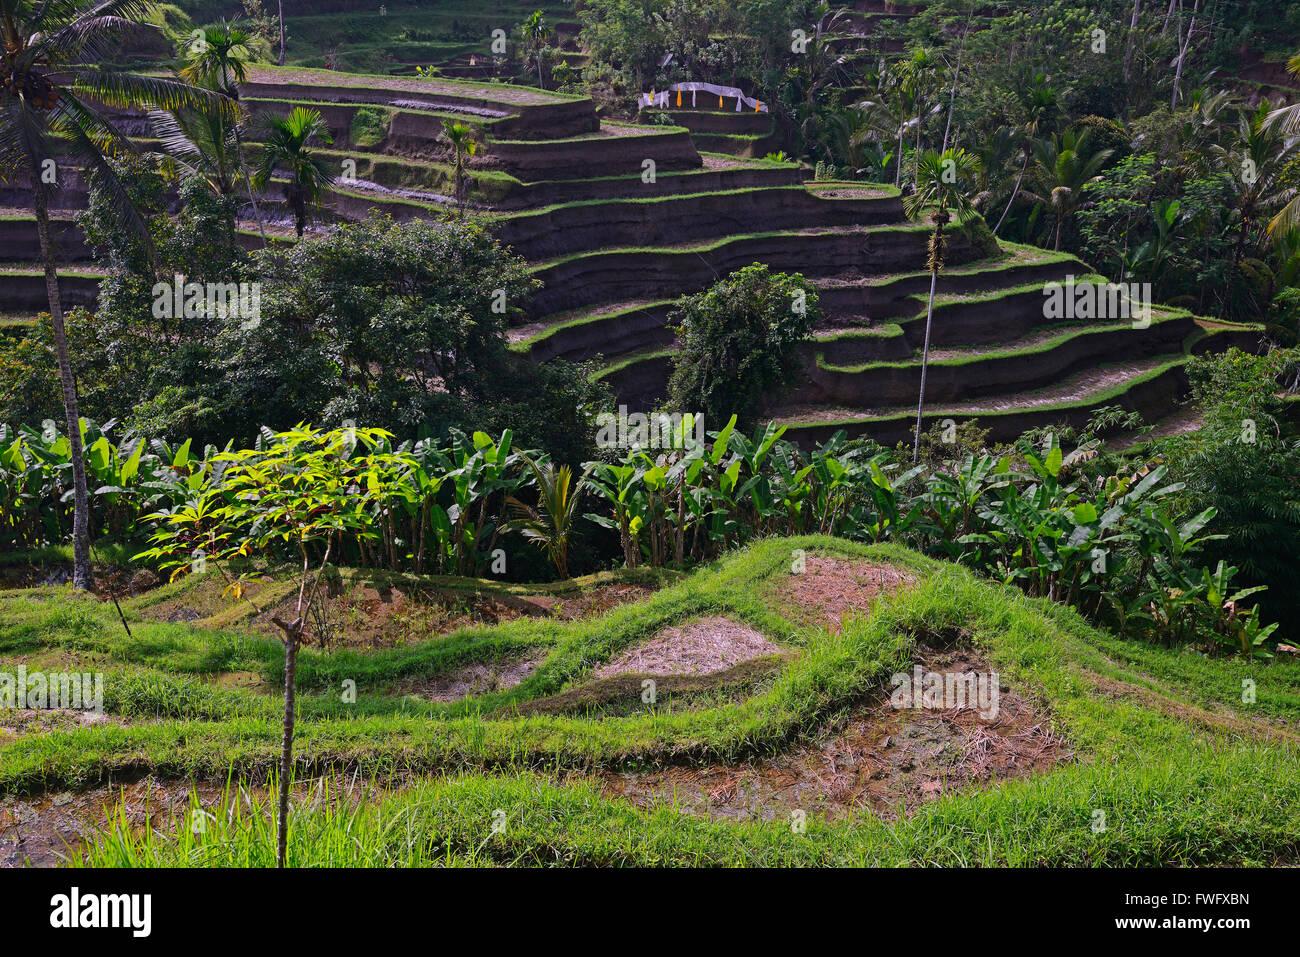 Reisterassen bei Tegallalang, Bali, Indonesien - Stock Image